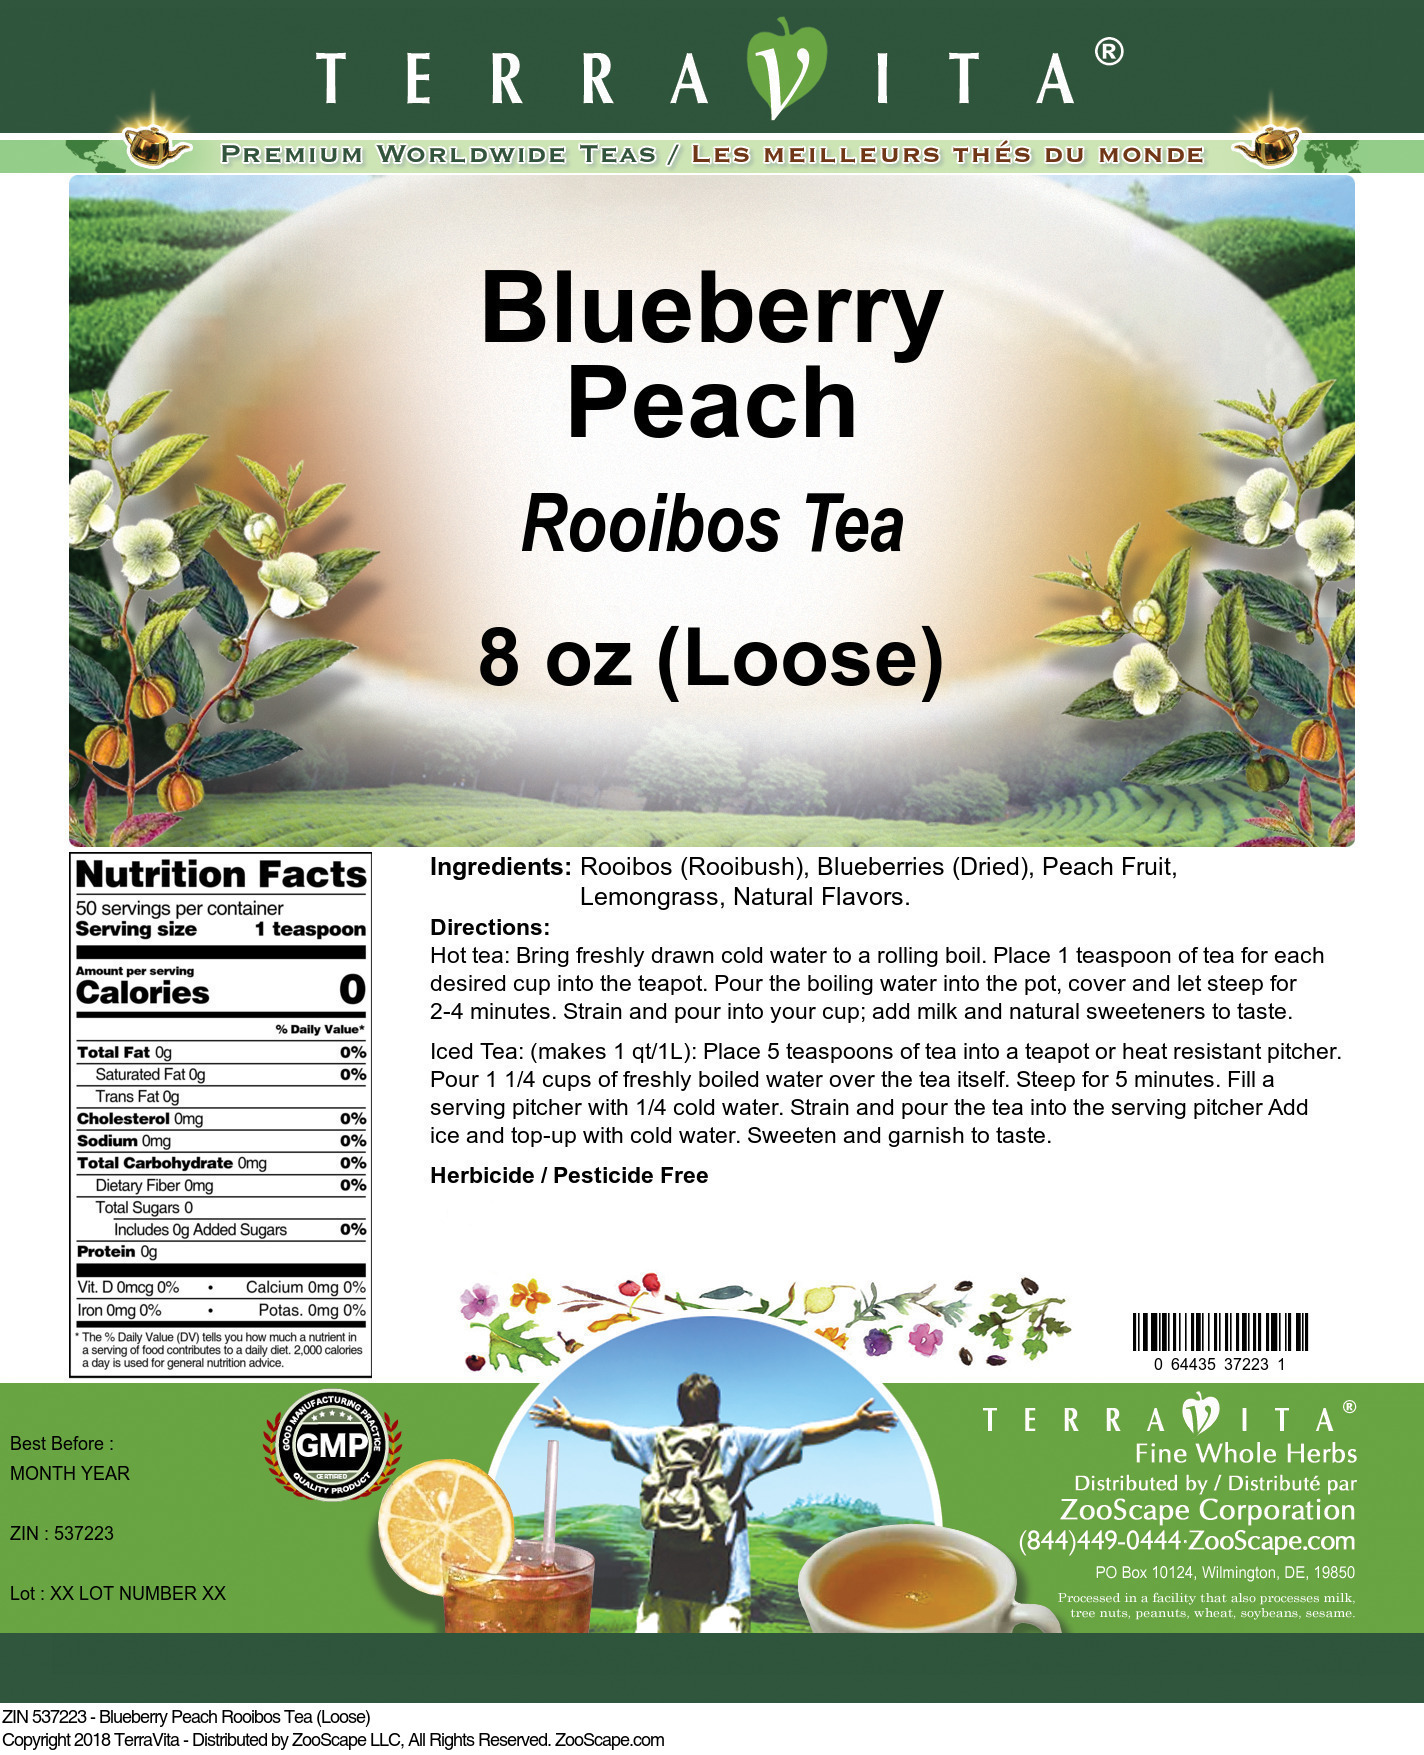 Blueberry Peach Rooibos Tea (Loose)